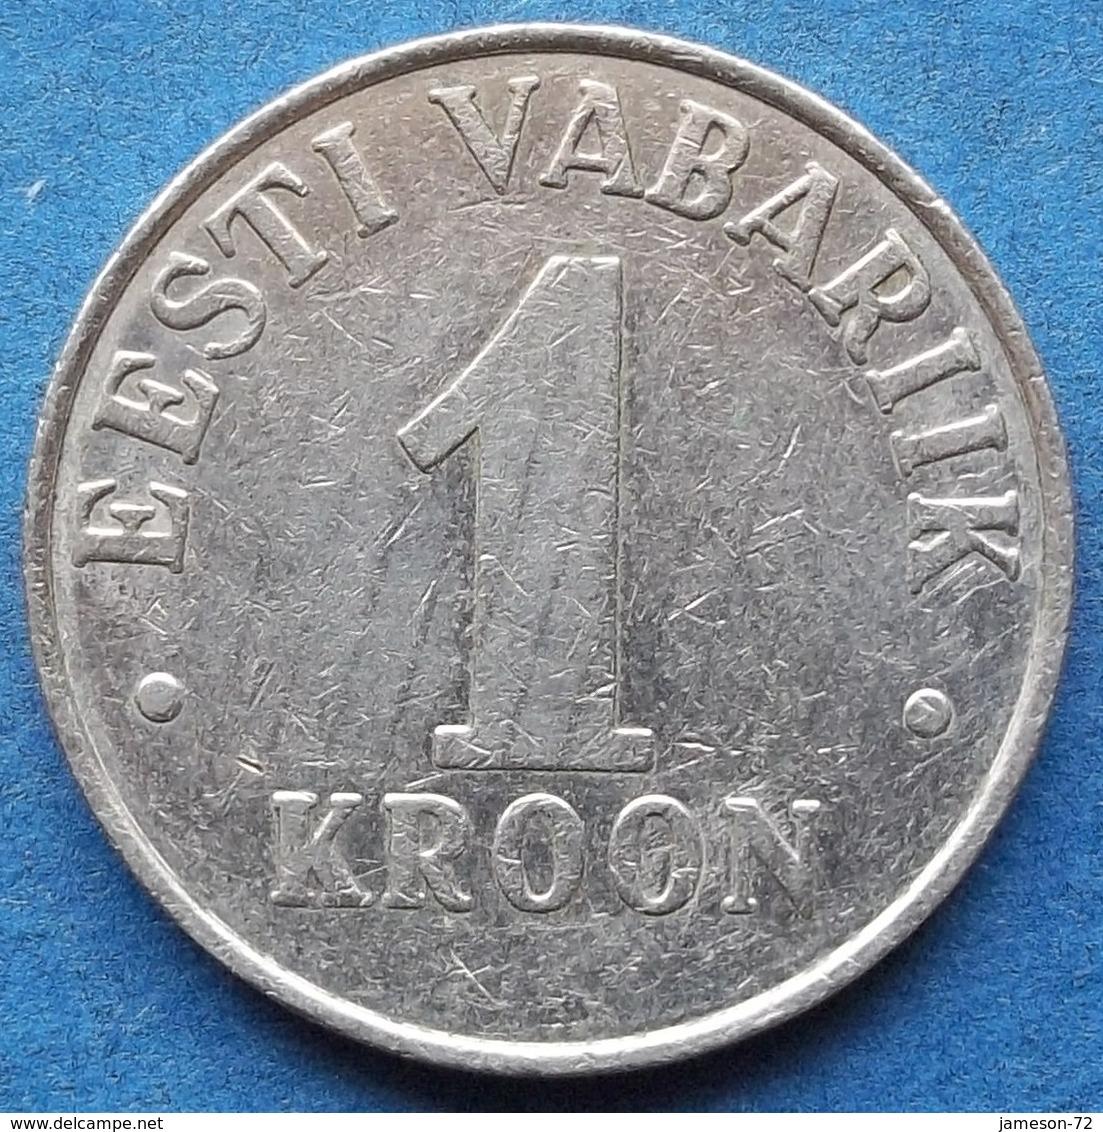 ESTONIA - 1 Kroon 1995 KM# 28 Kroon Coinage (1991- 2010) - Edelweiss Coins - Estonie